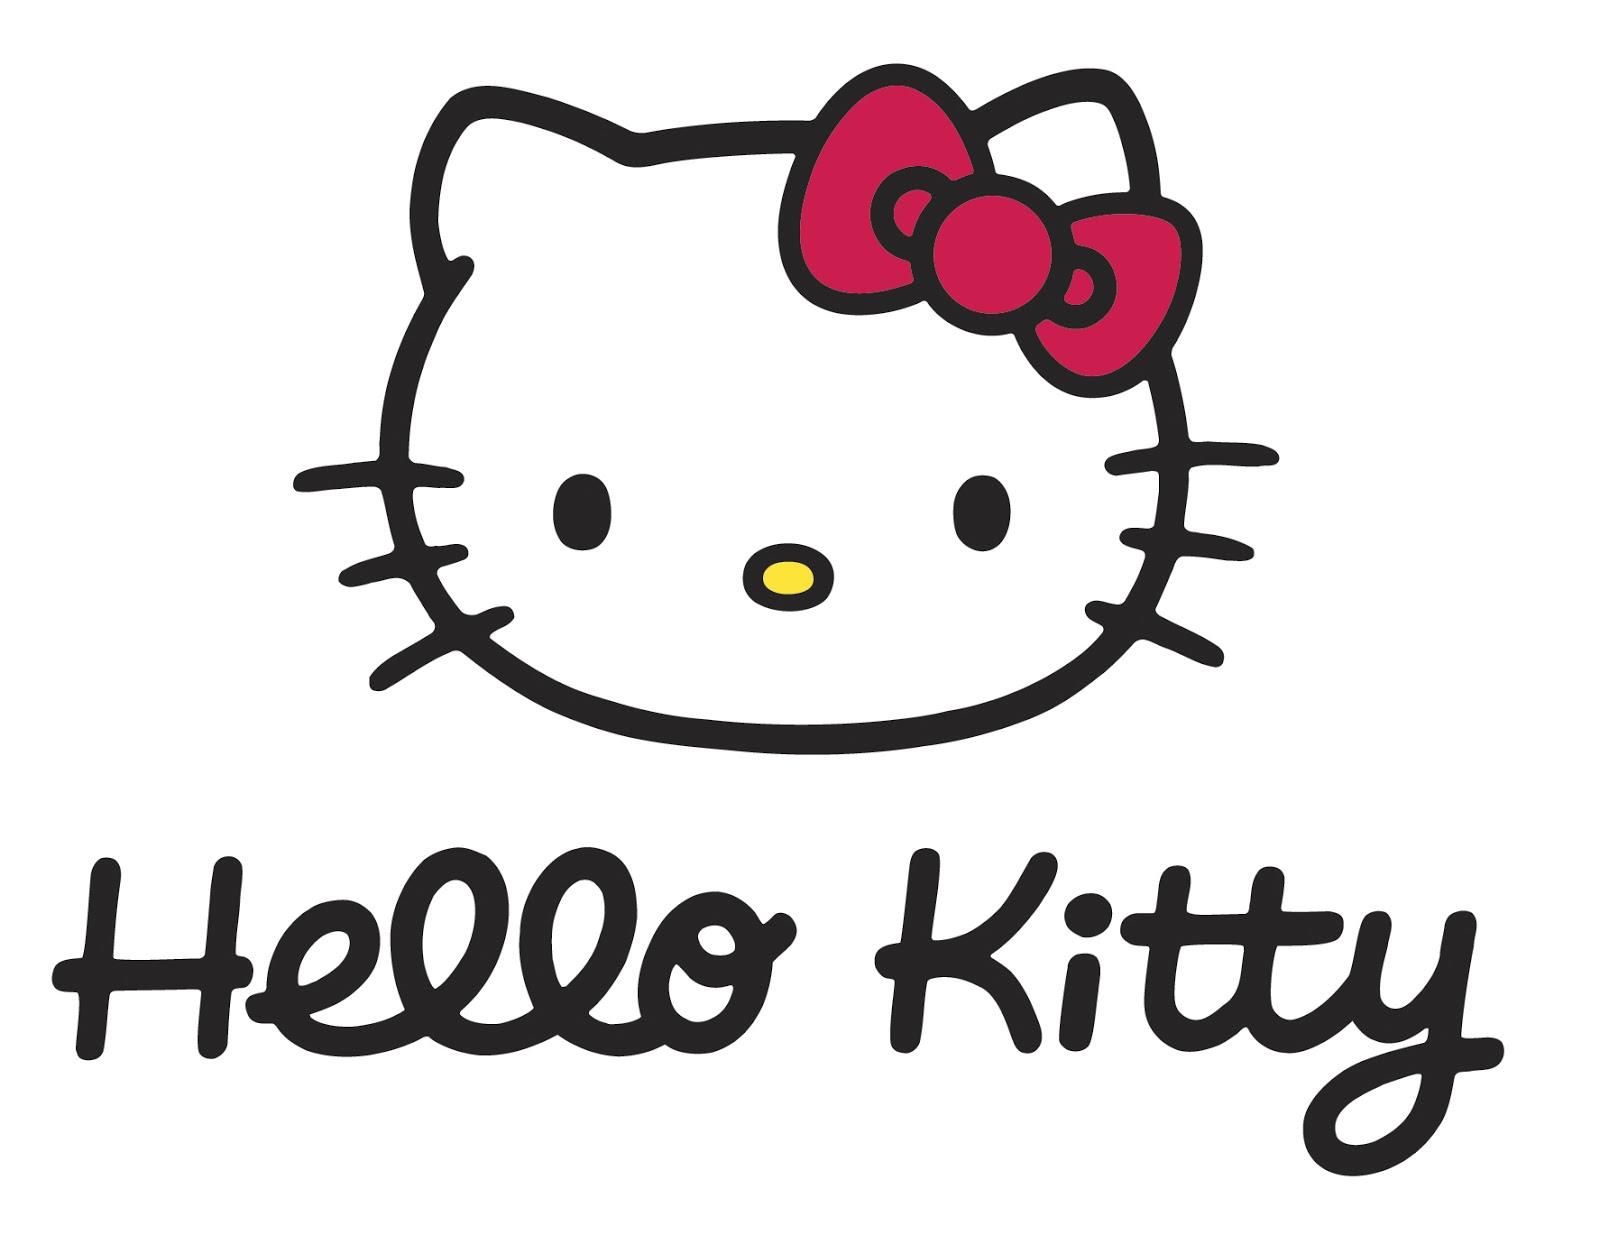 ... Gambar Hello Kitty Terbaru ini dapat menambah koleksi gambar animasi